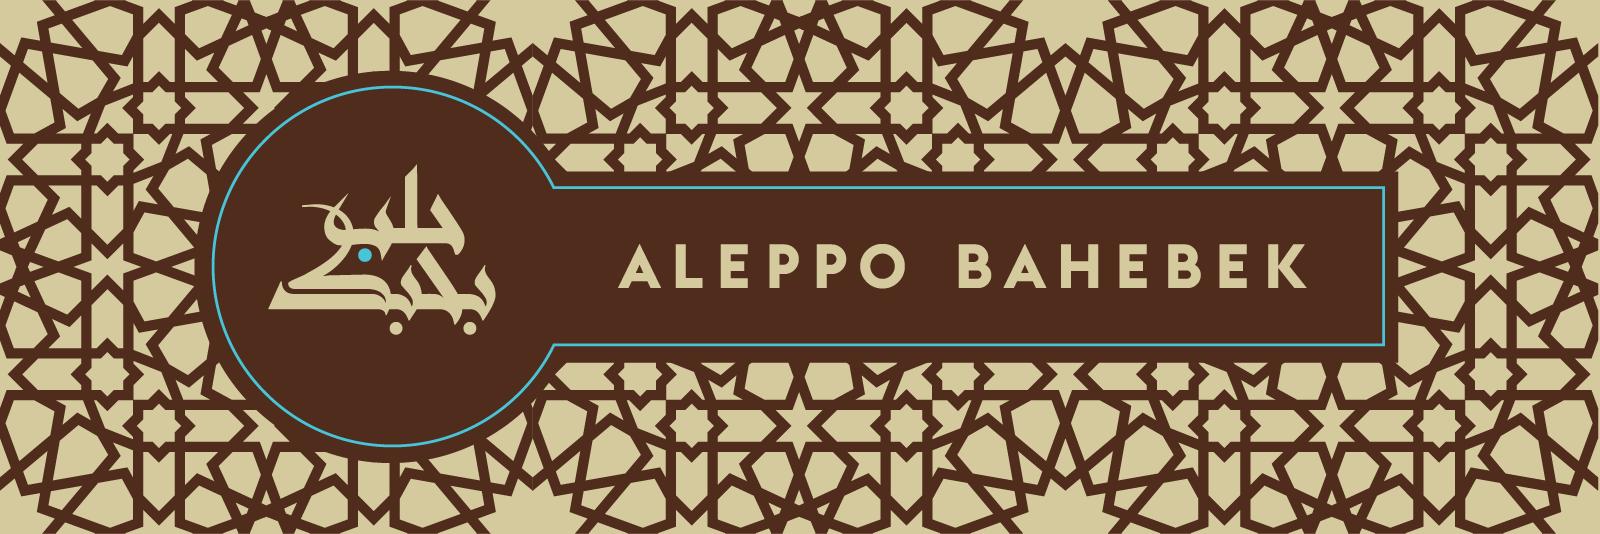 Aleppo Bahebek – skilt